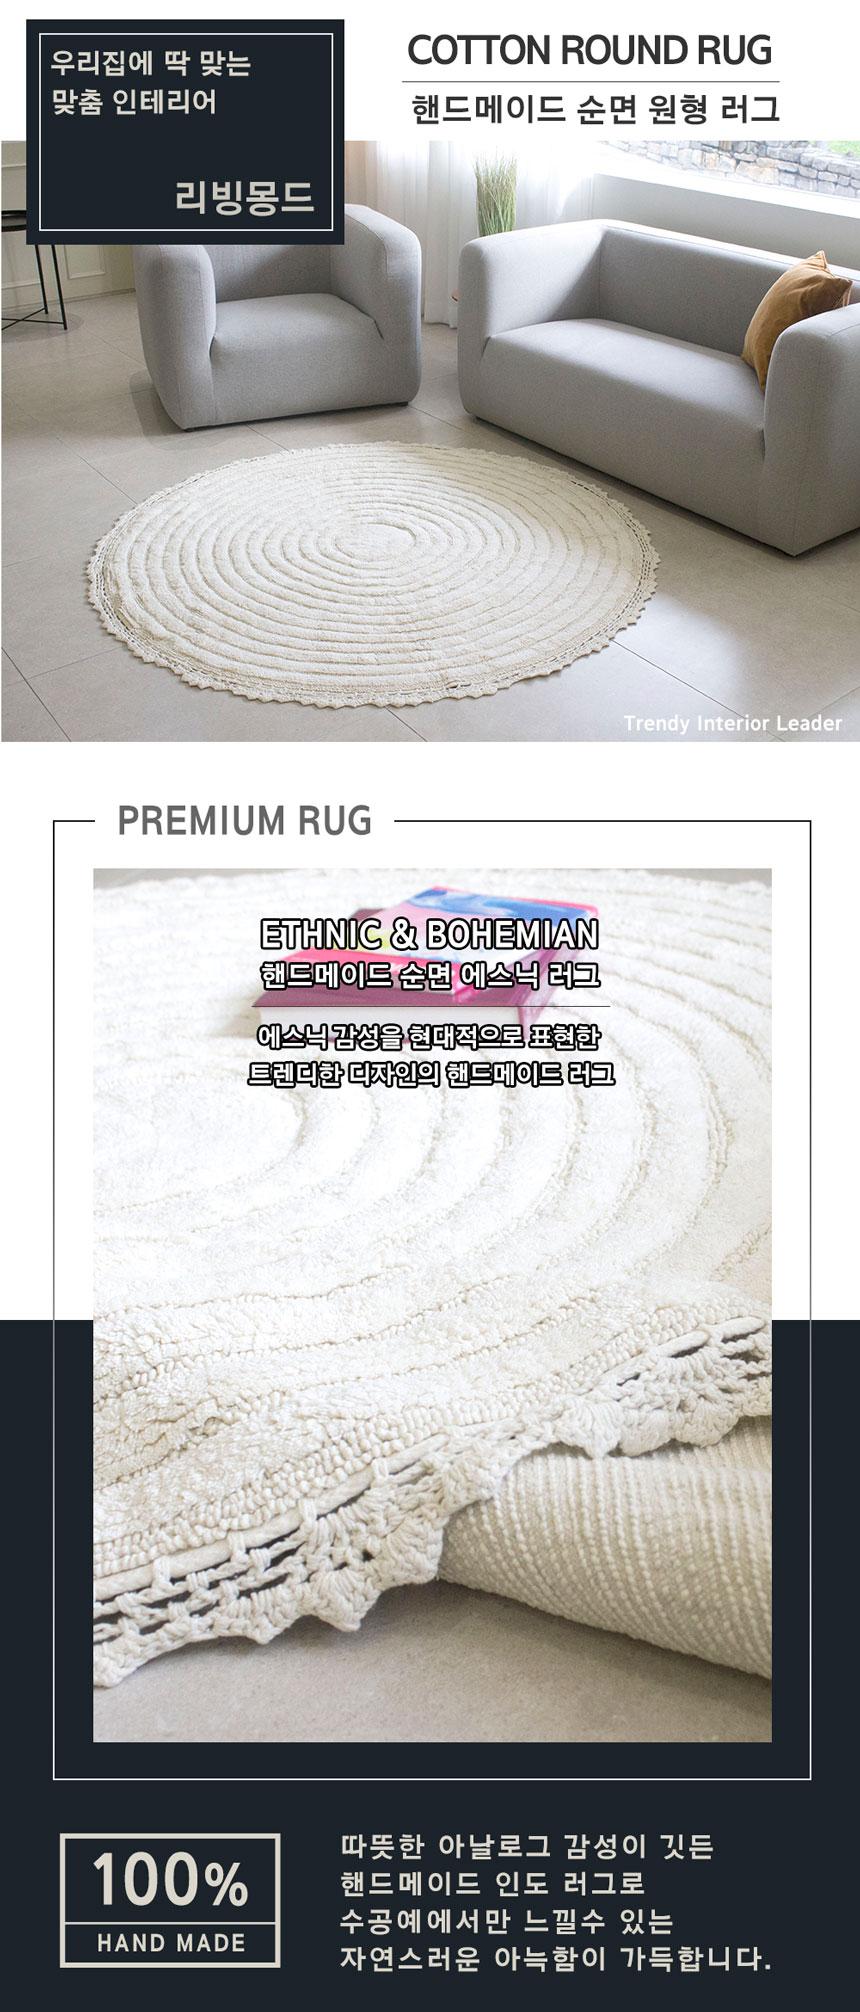 main_copy.jpg